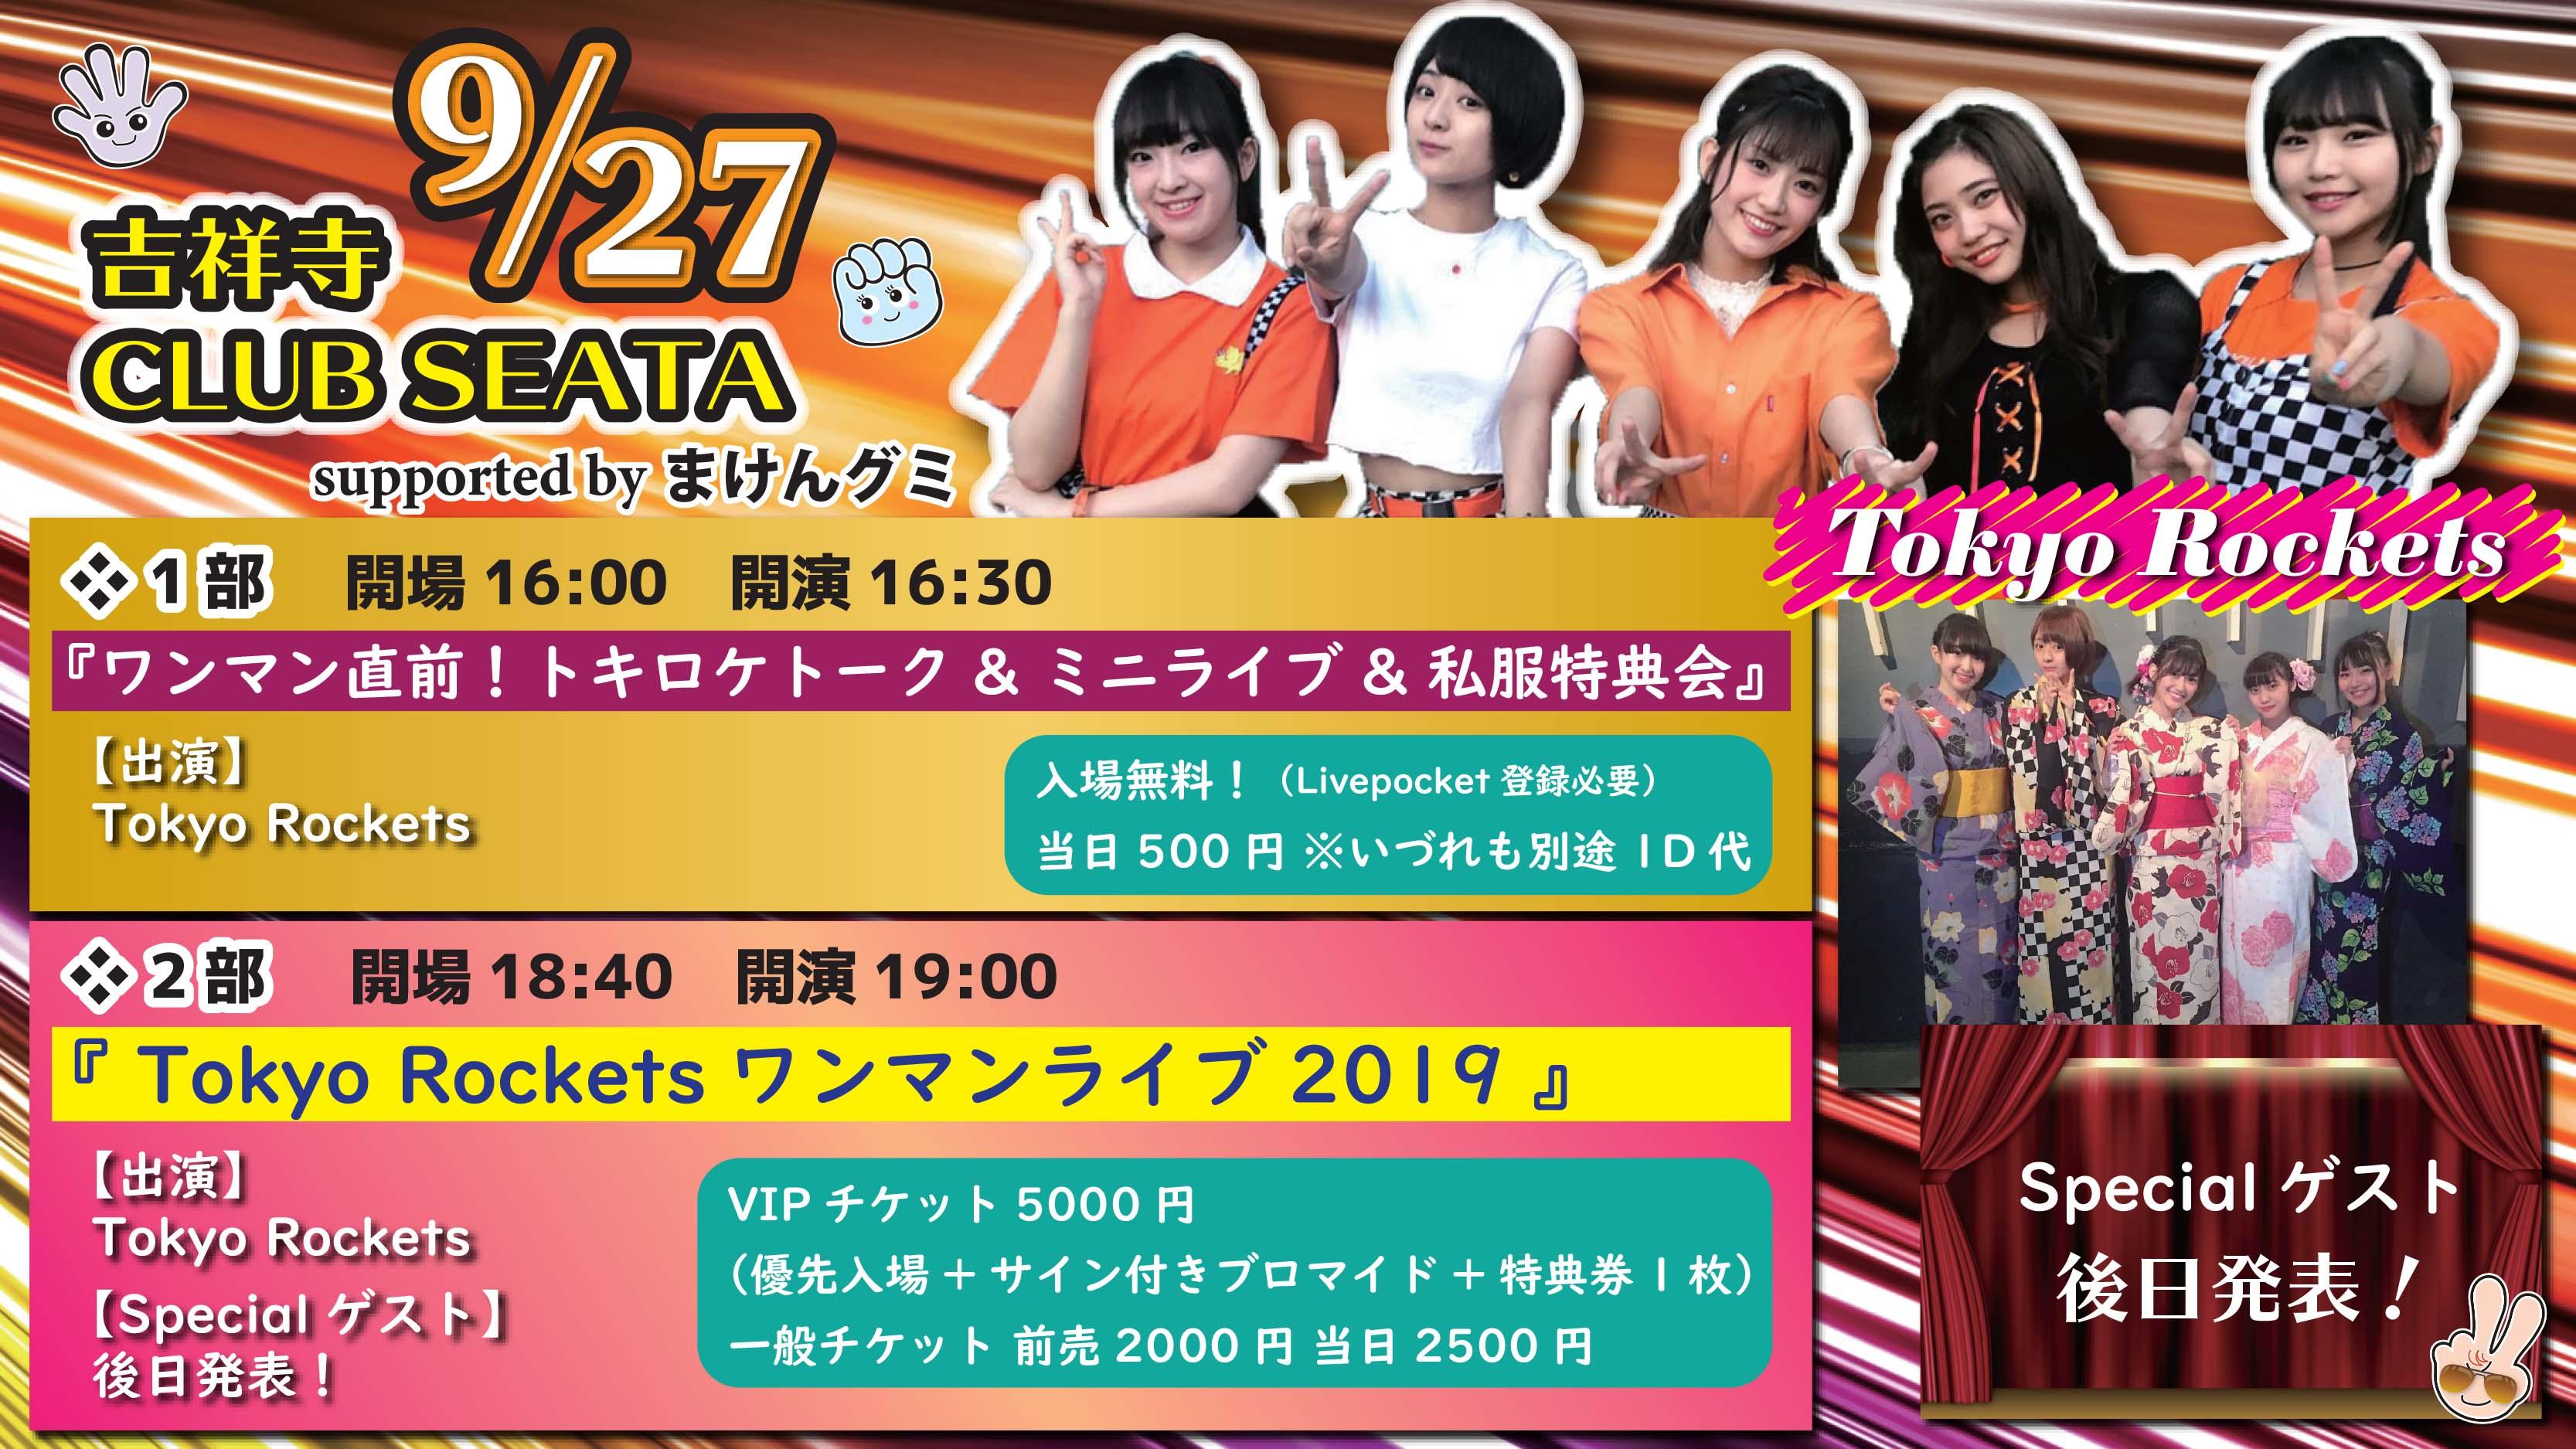 Tokyo Rocketsワンマンライブ supported byまけんグミ